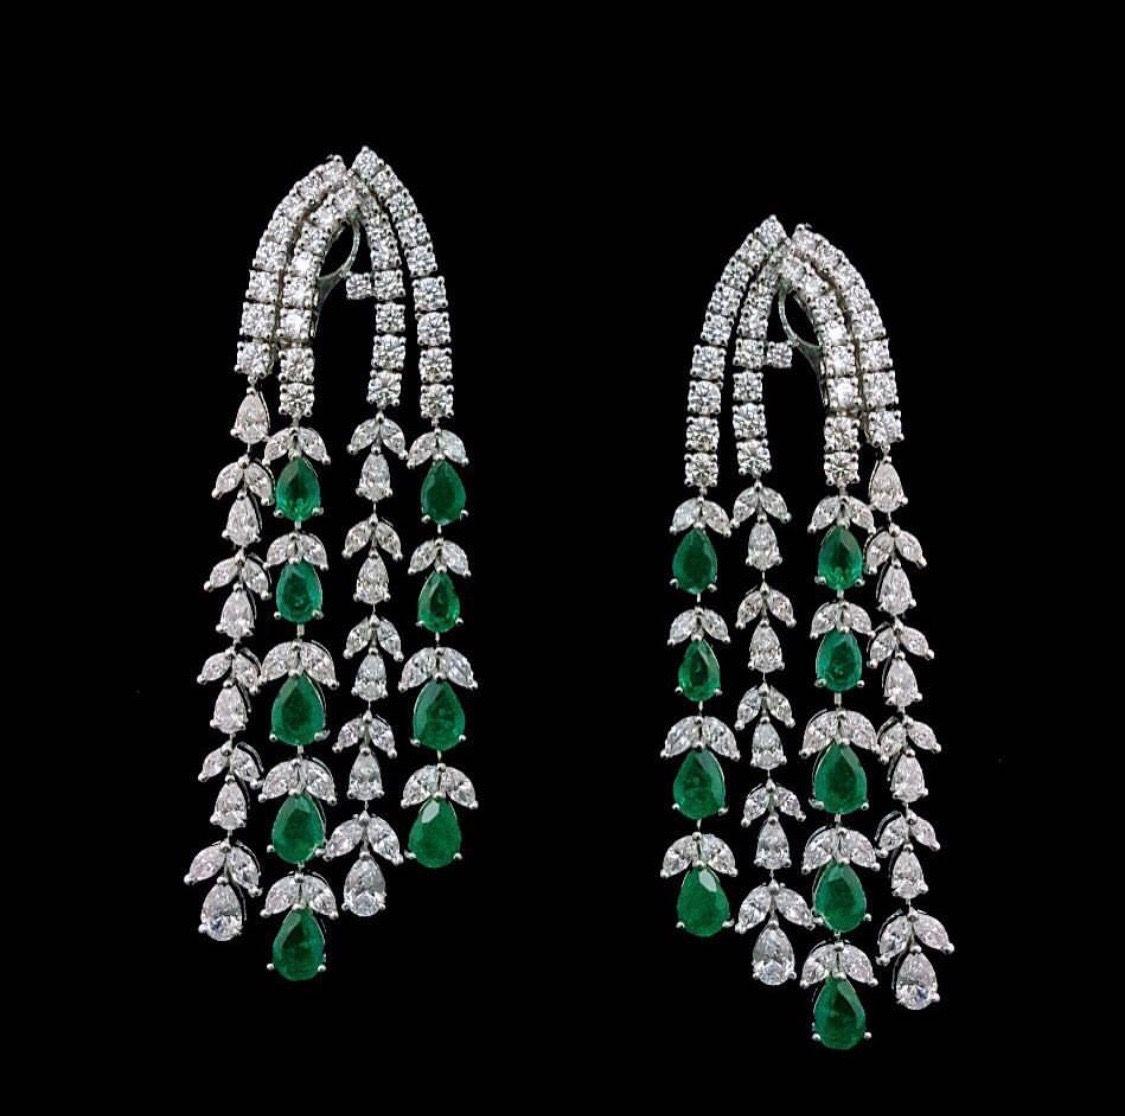 Pin By Sabina Corona On Jewelry Long Diamond Earrings Gemstone Brooch Swarovski Crystal Drop Earrings